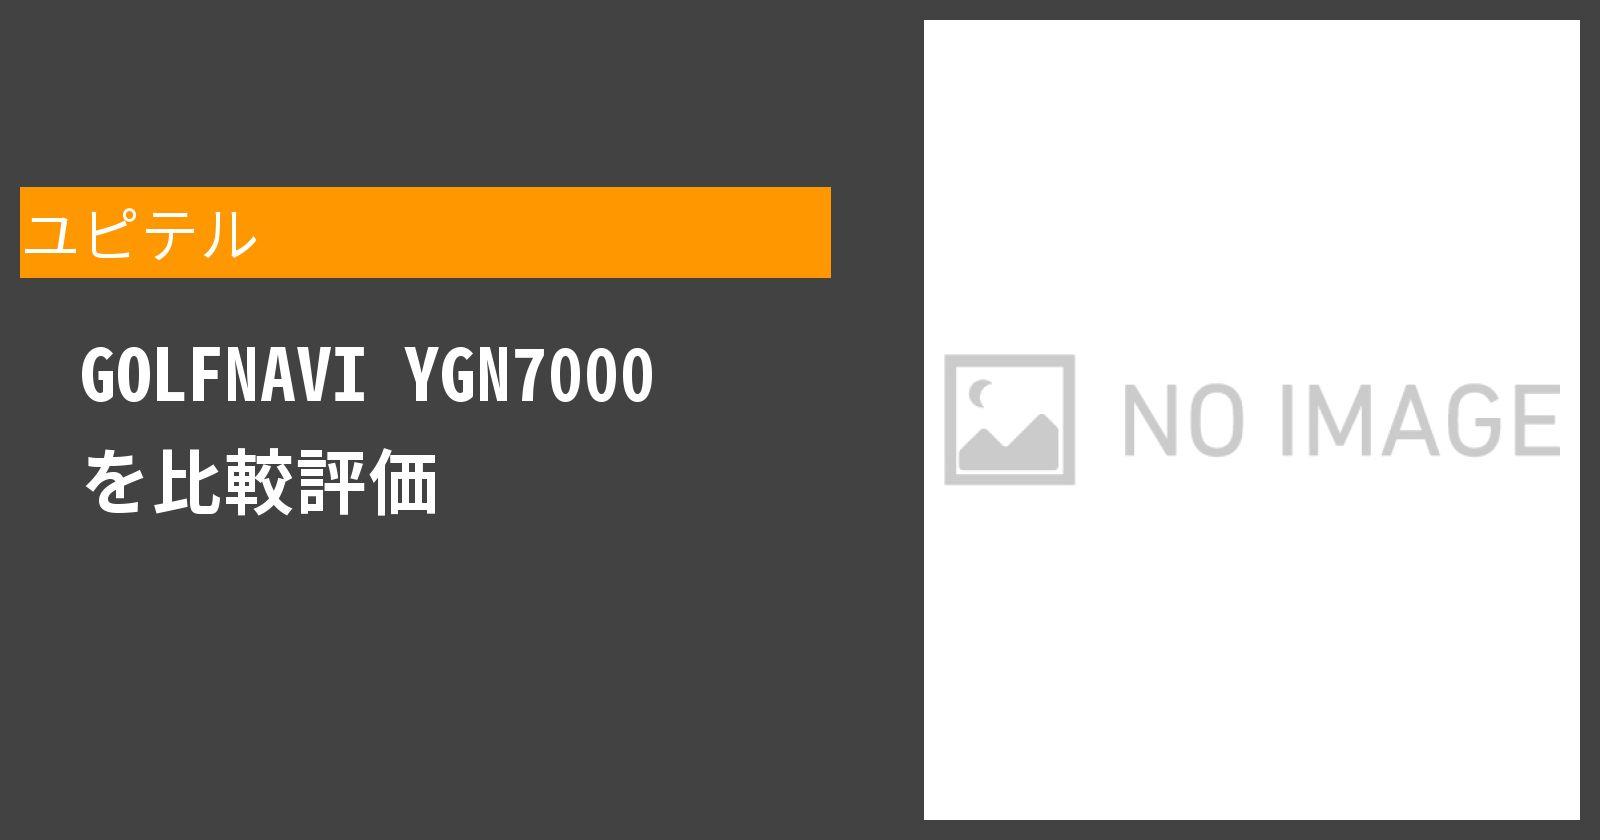 GOLFNAVI YGN7000を徹底評価